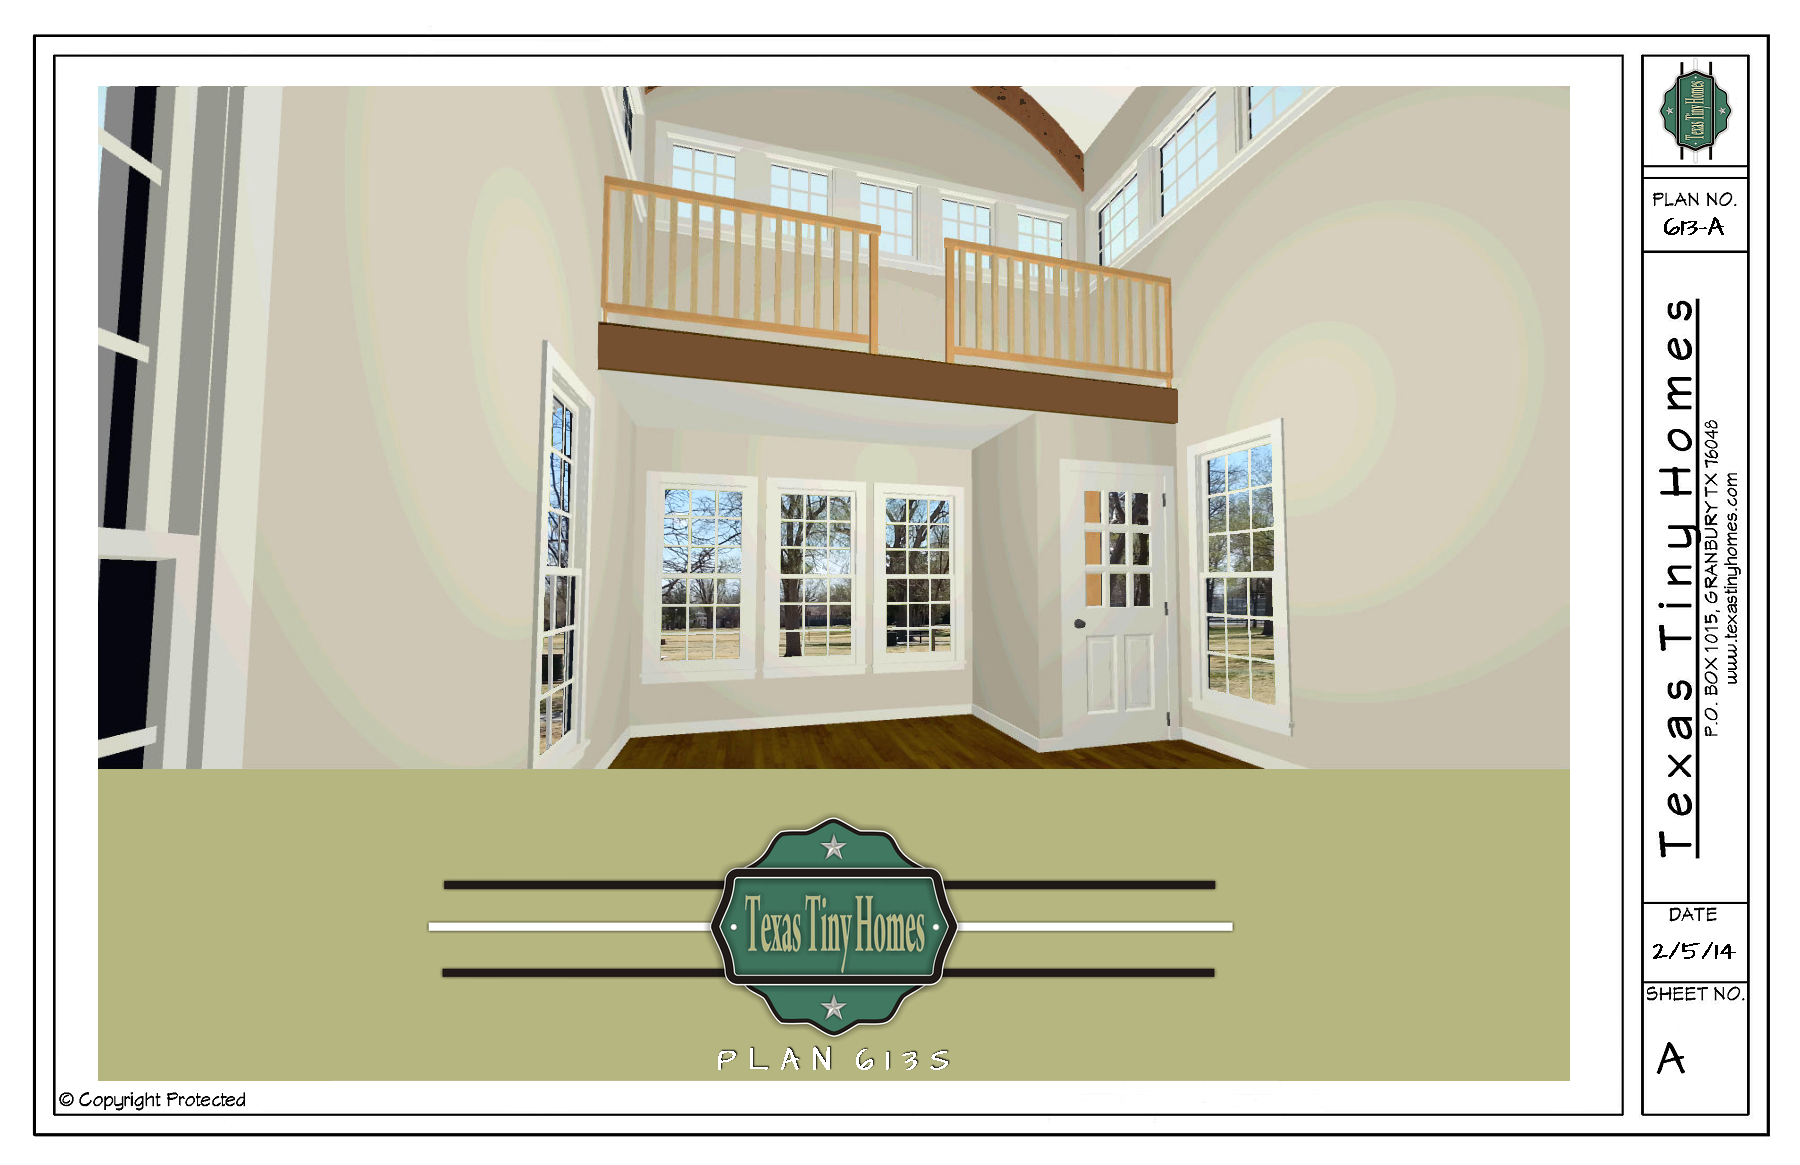 Tiny Home Designs: Plan 613-S